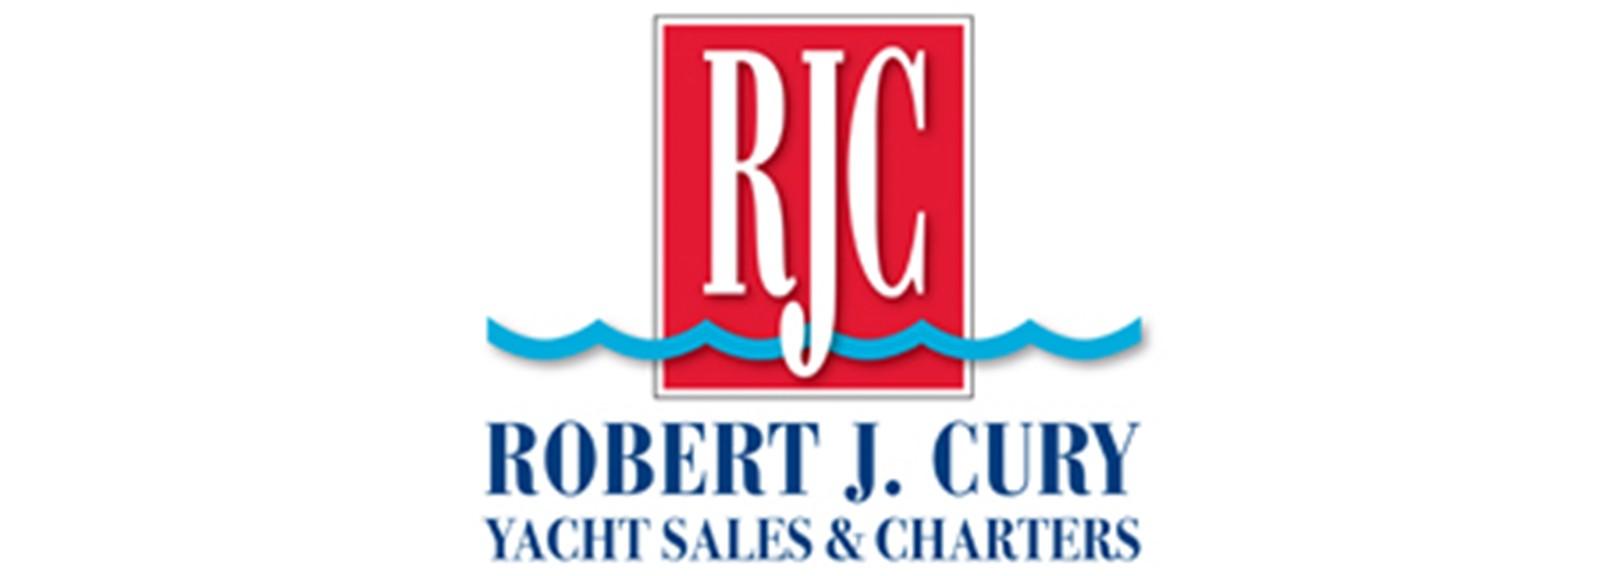 RJC Yacht Sales